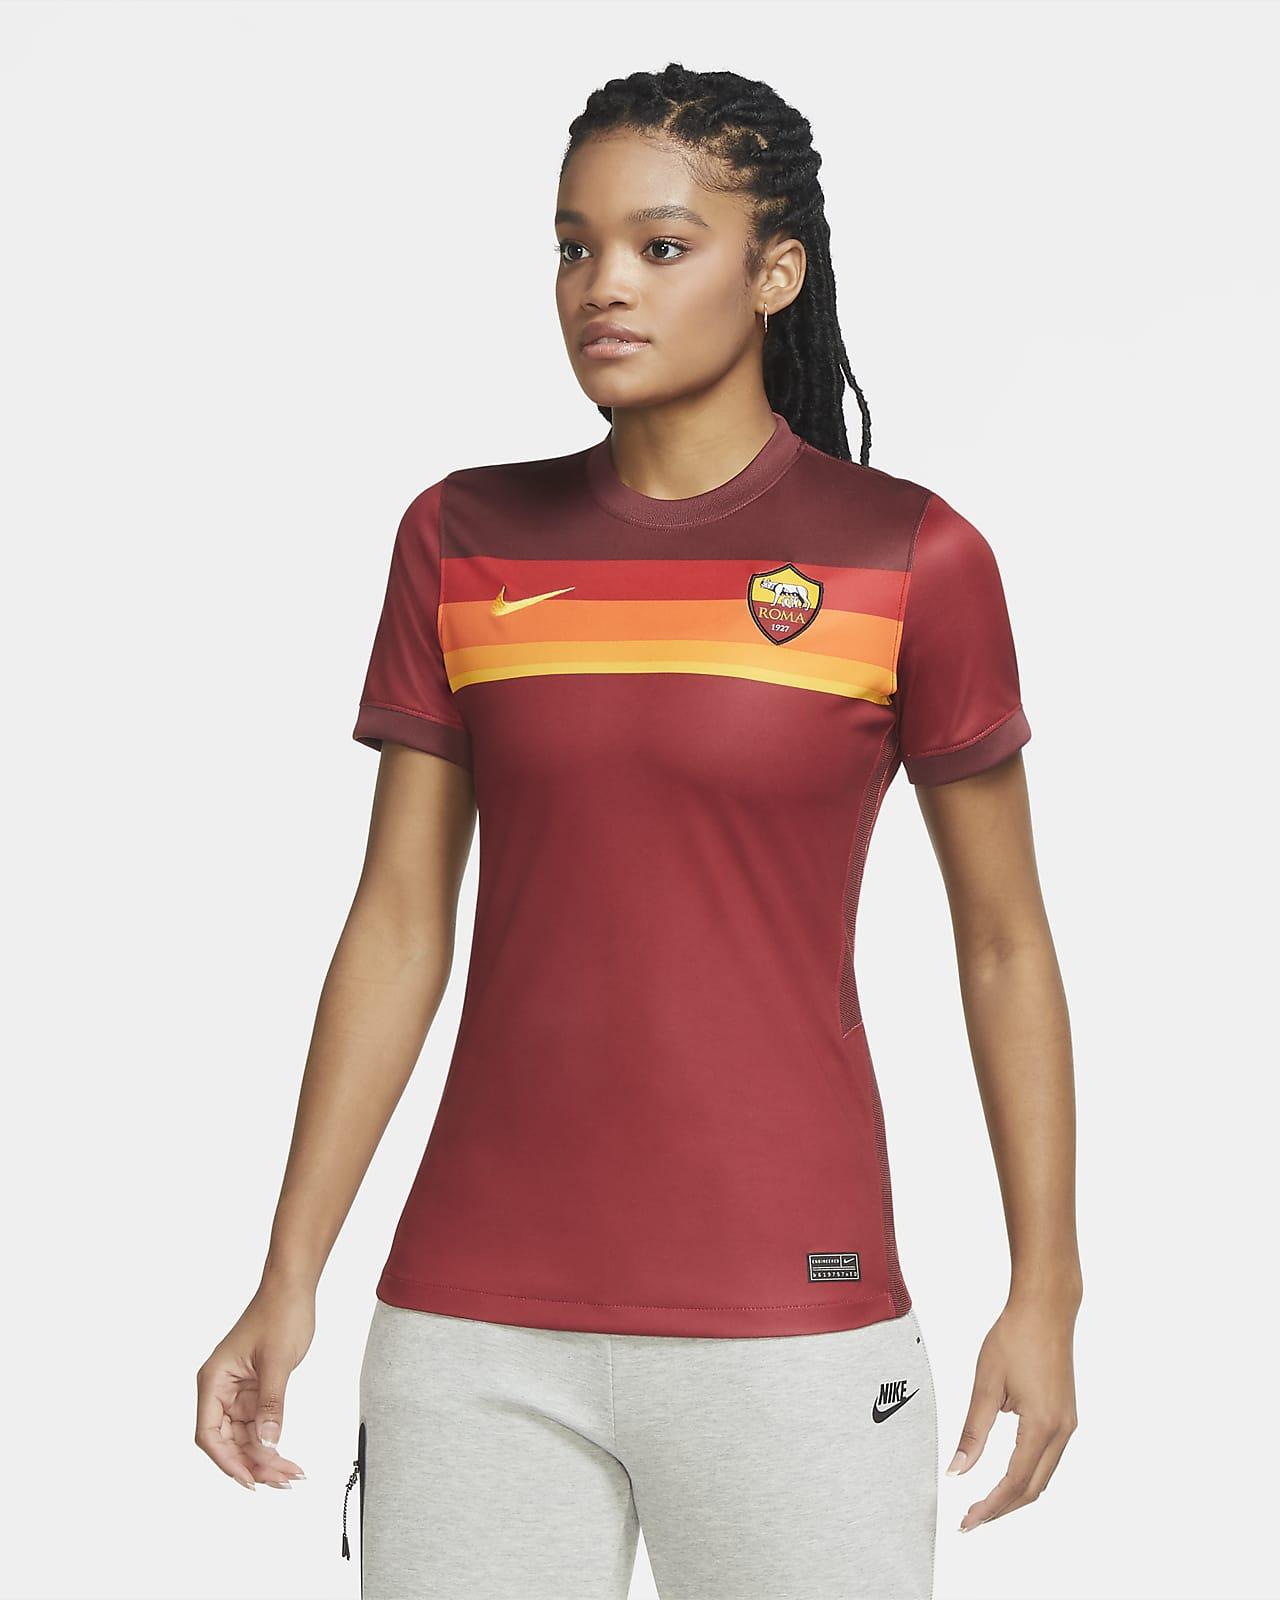 A.S. Roma 2020/21 Stadyum İç Saha Kadın Futbol Forması